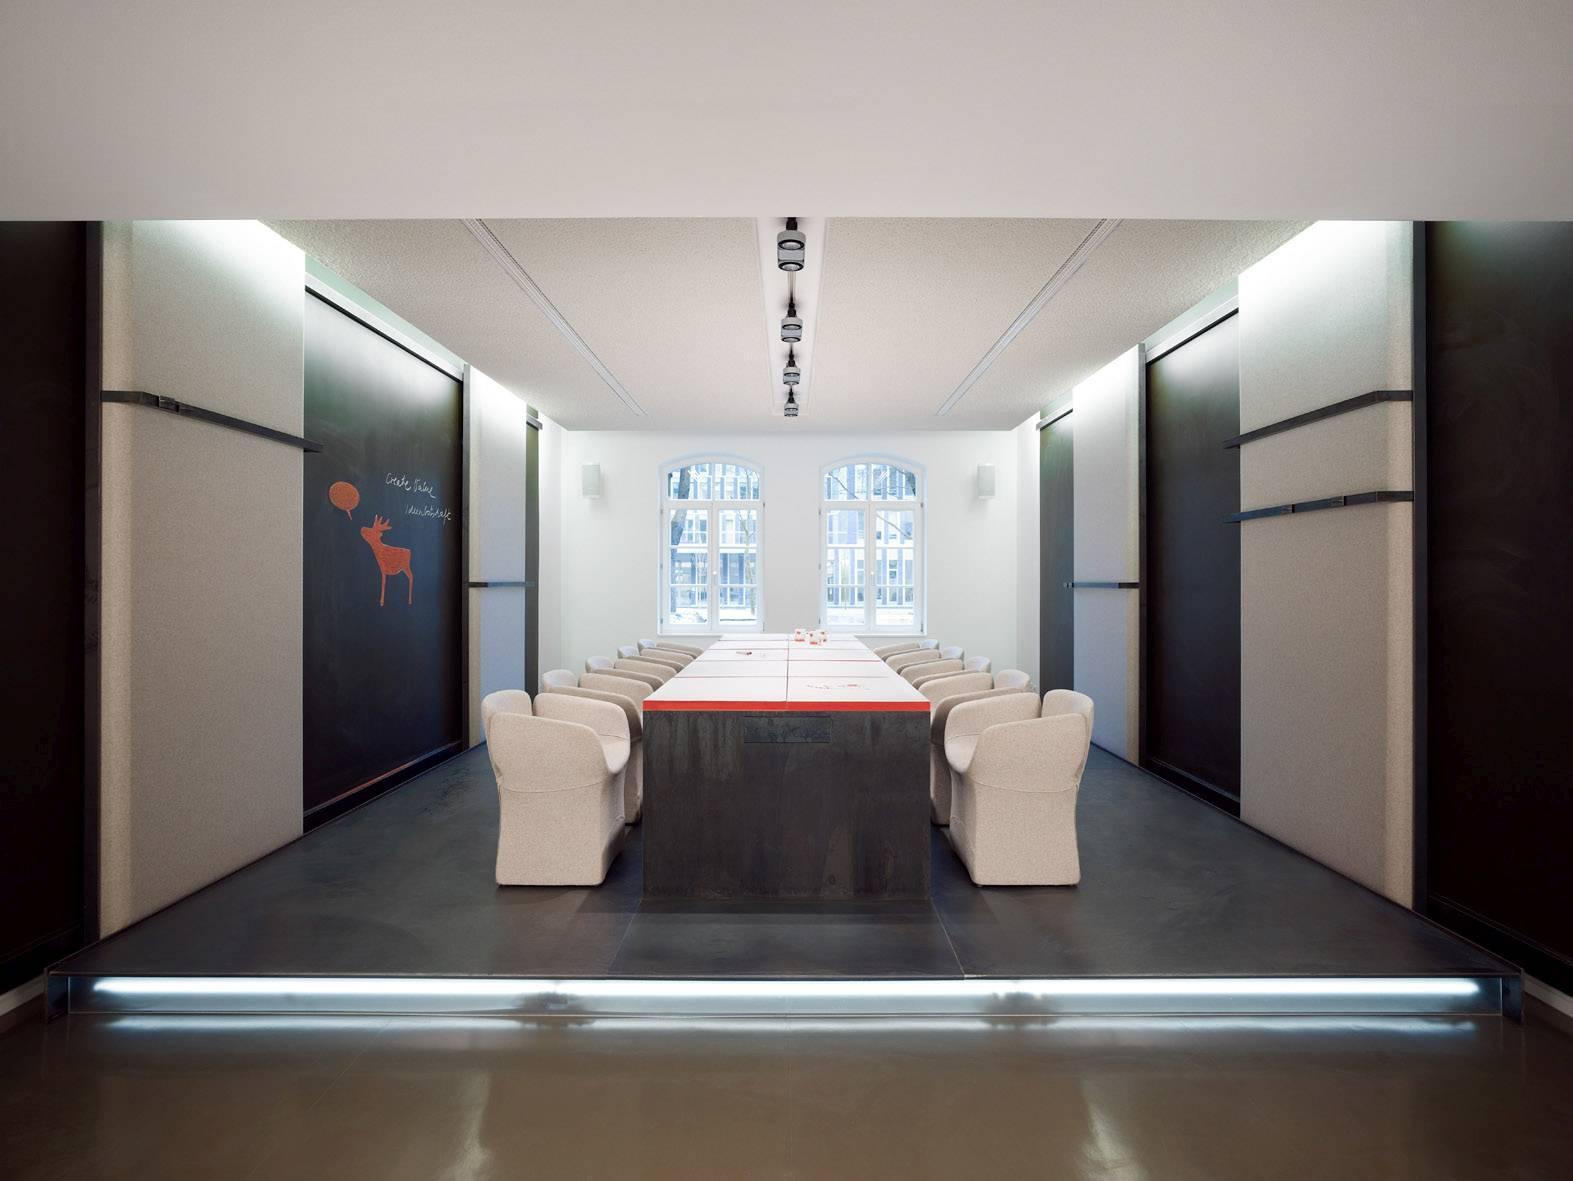 ideenbotschaft innenraum d sseldorf innenarchitektur. Black Bedroom Furniture Sets. Home Design Ideas